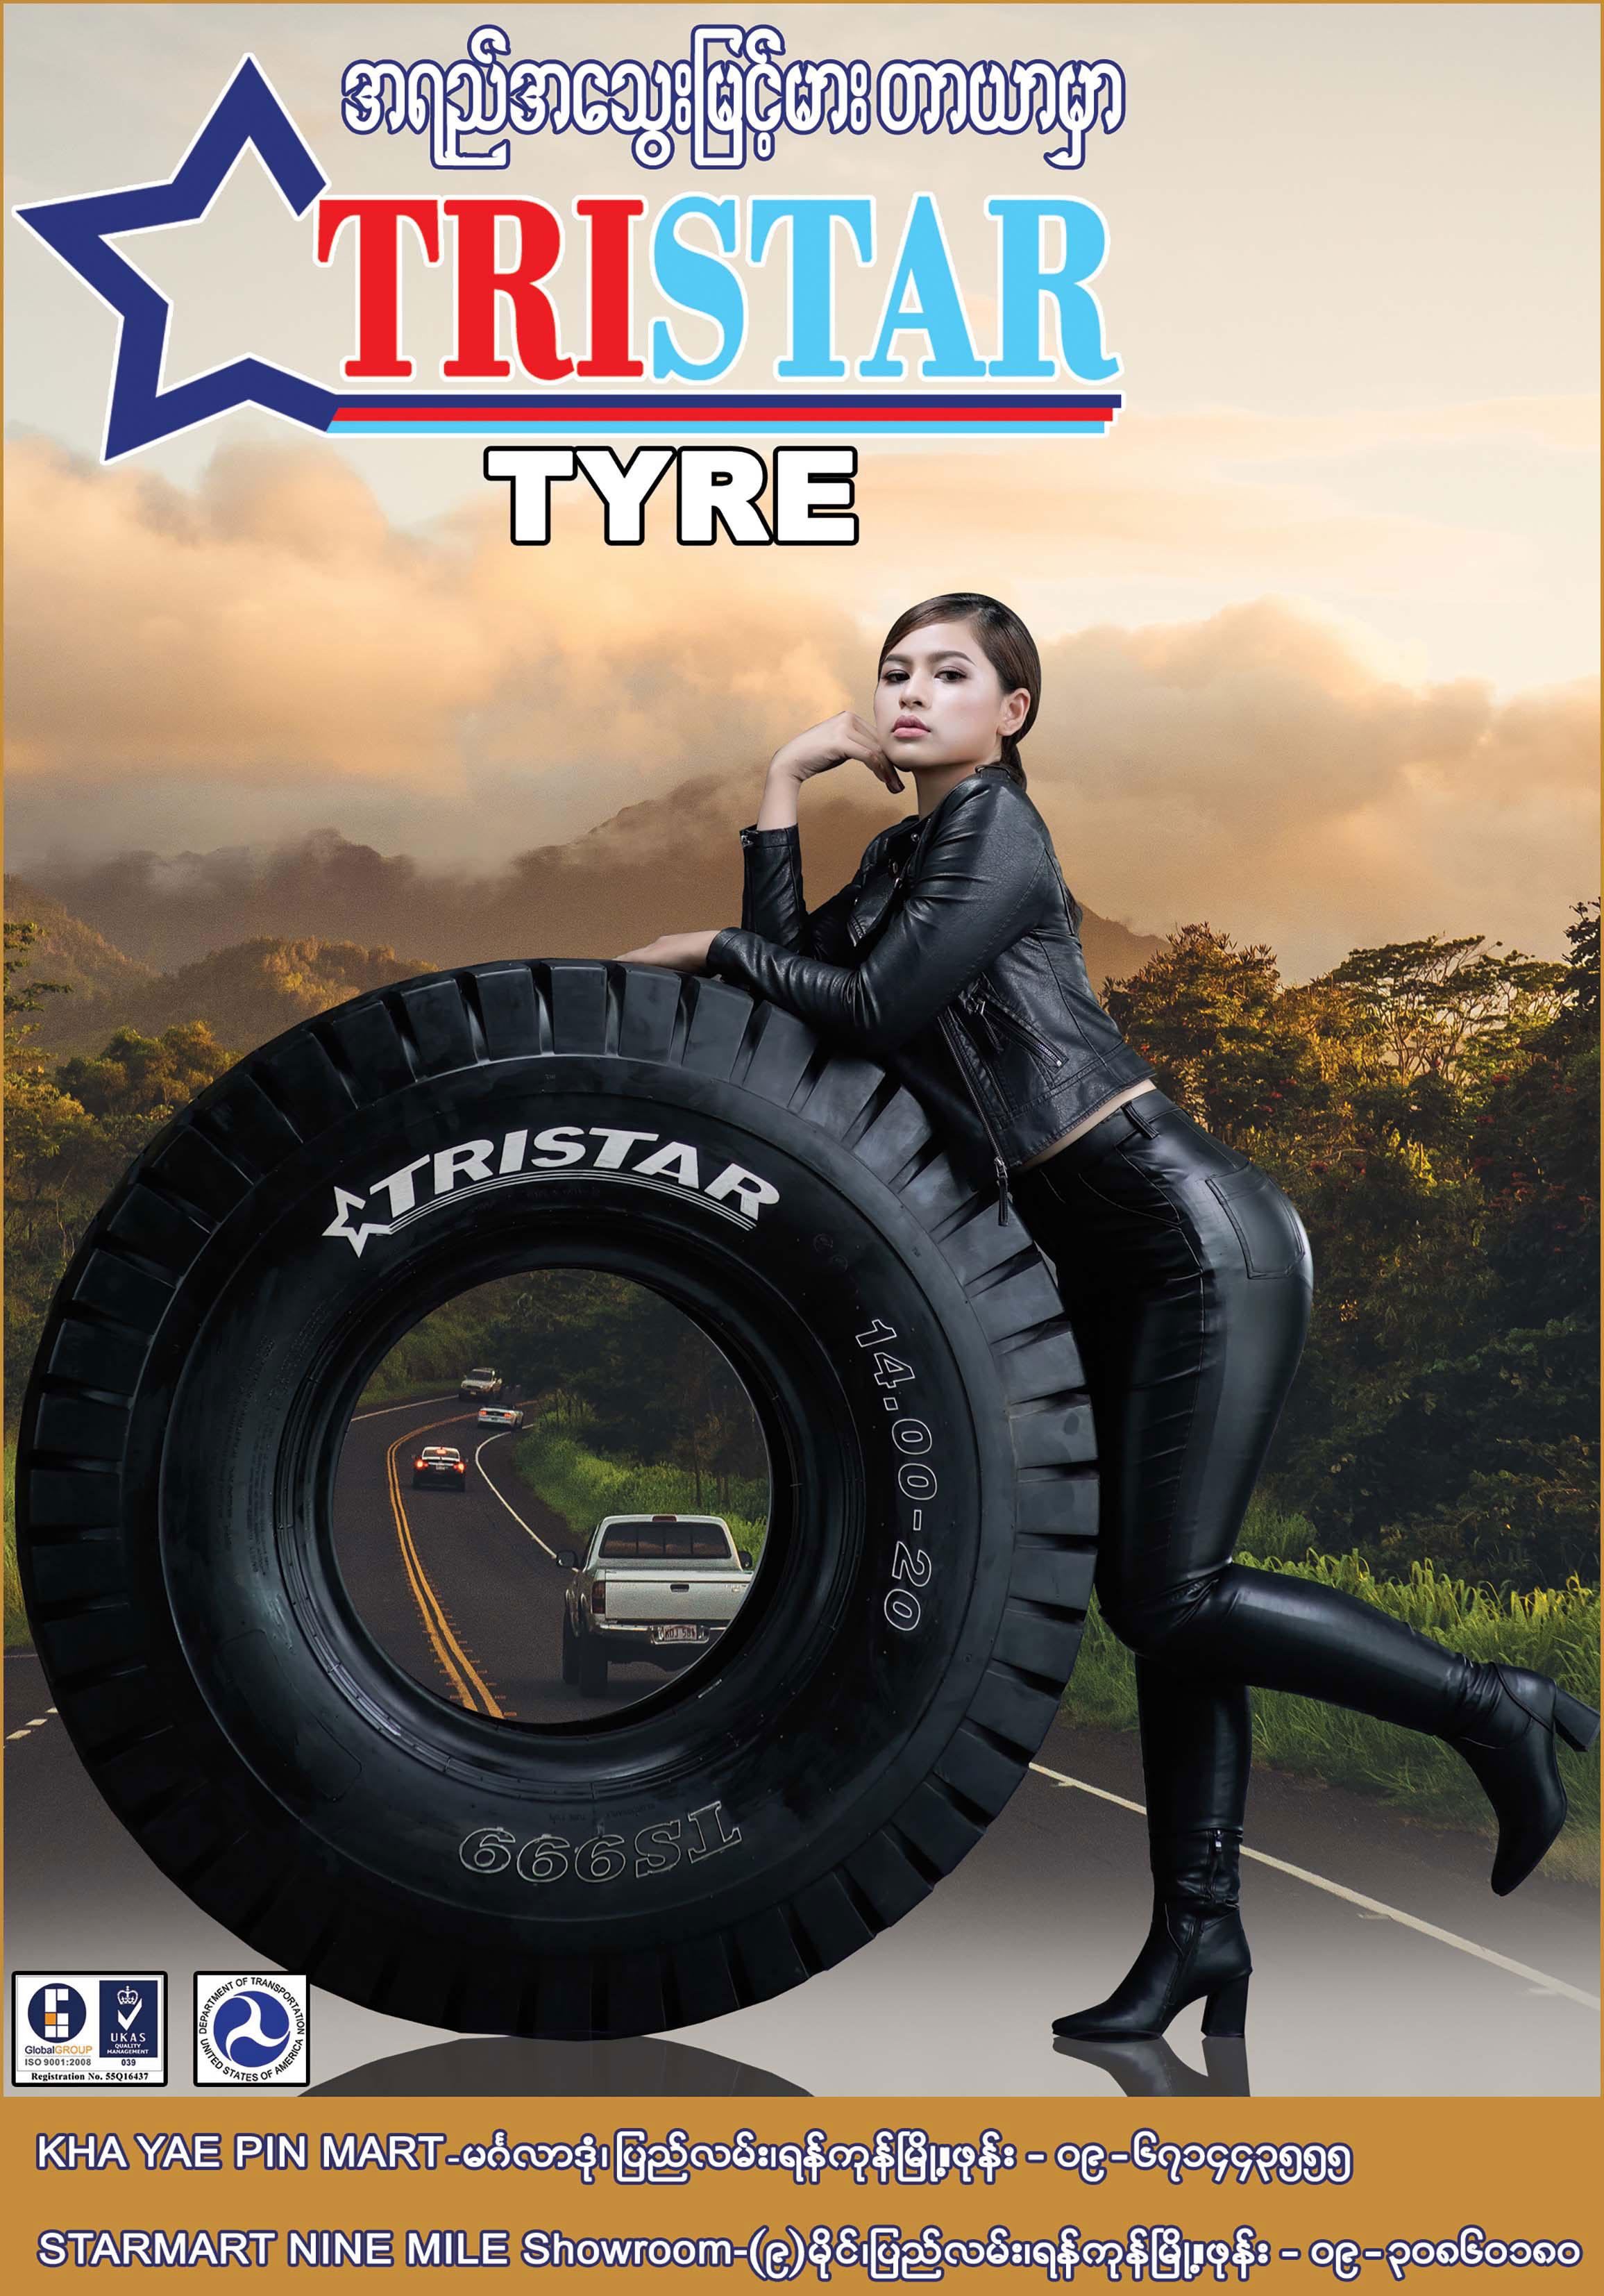 Tristar Tyre